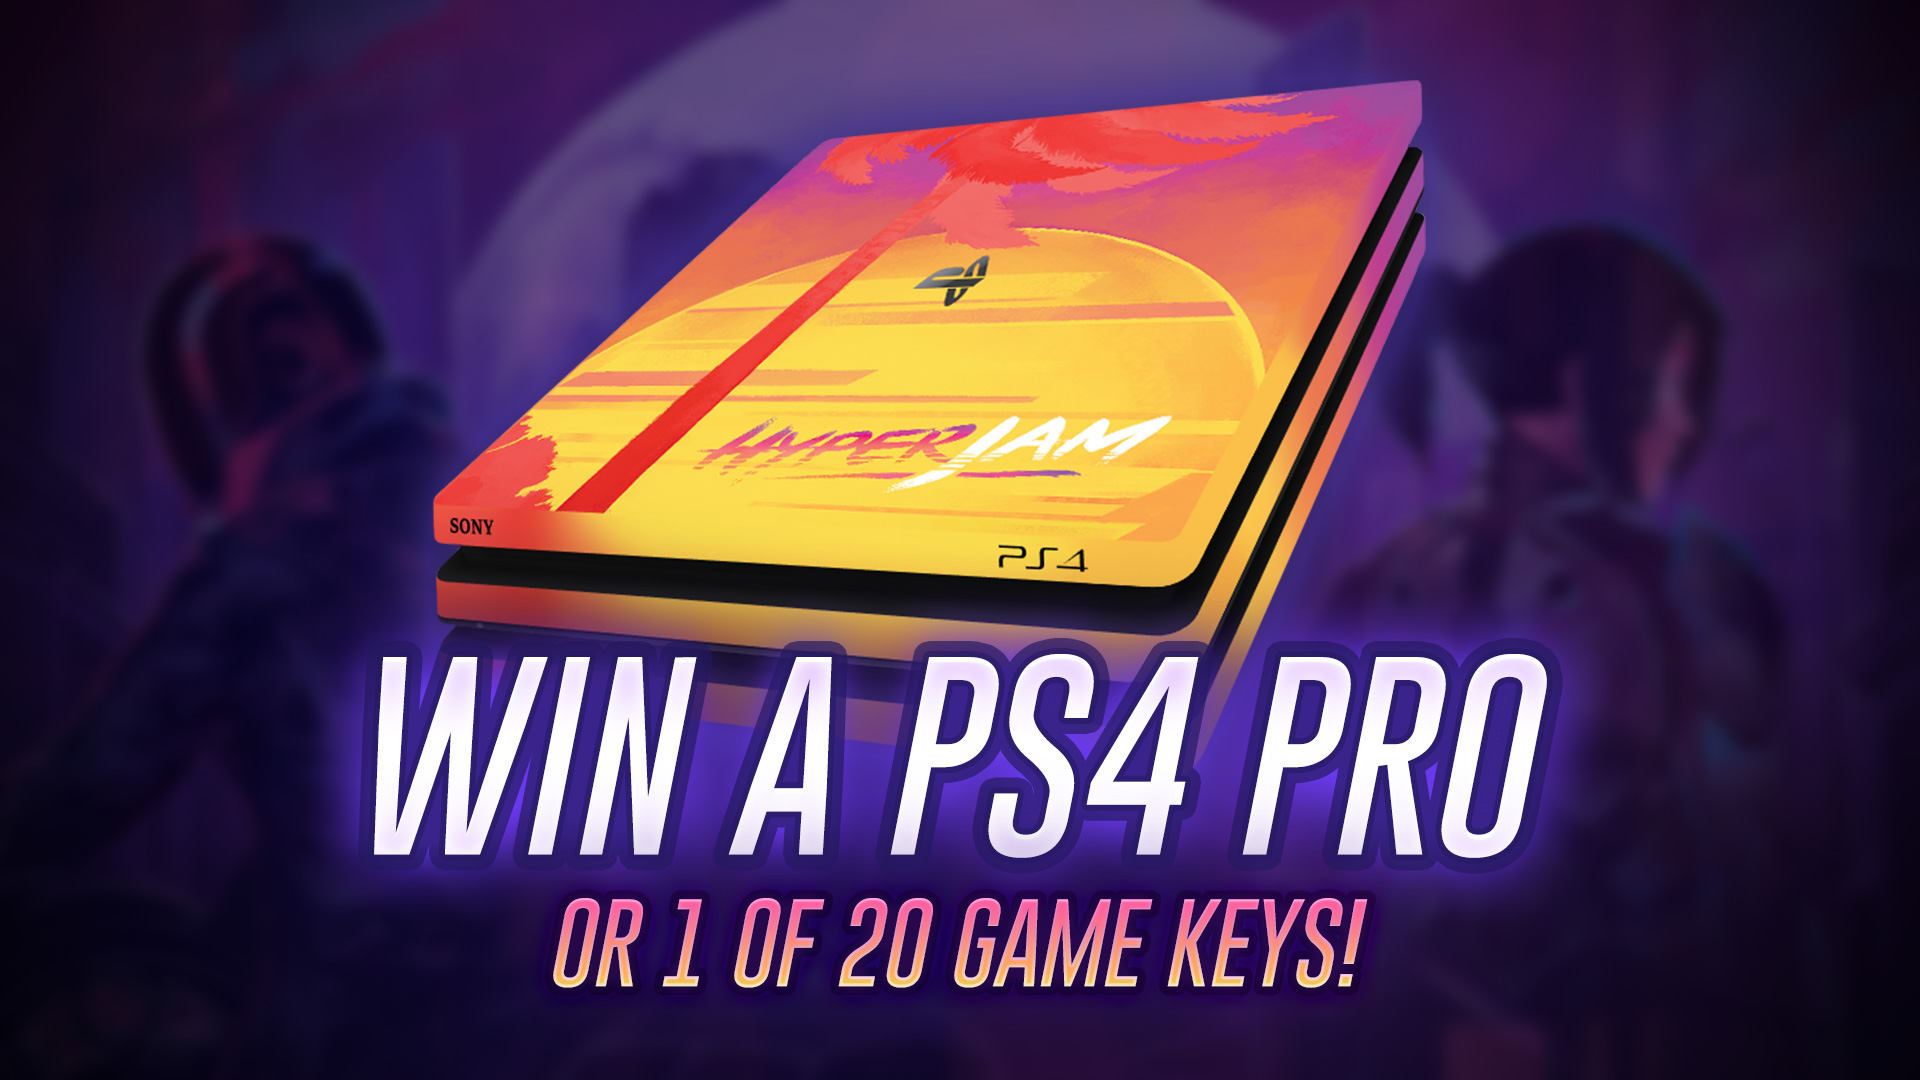 Hyper Jam PS4 Pro Giveaway